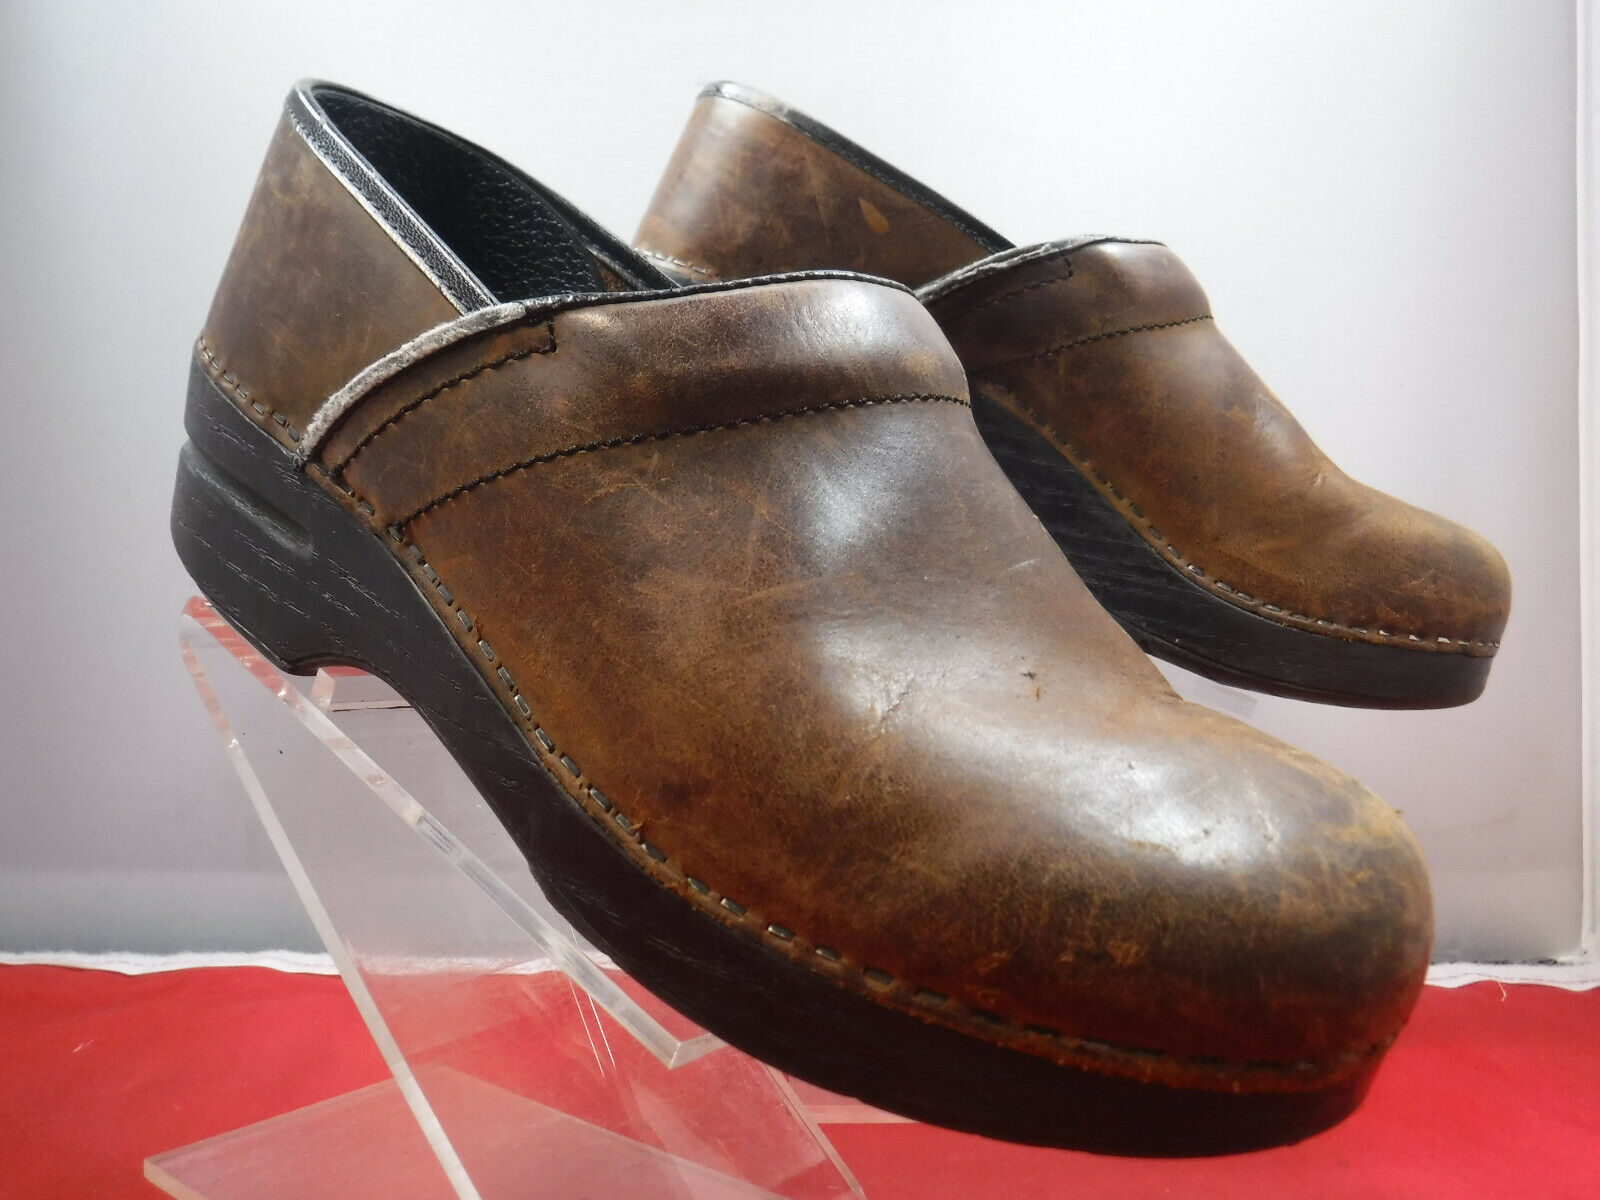 PFR Women's DANSKO Brown Leather Stapled Professional Clogs Sz 39 8.5 9